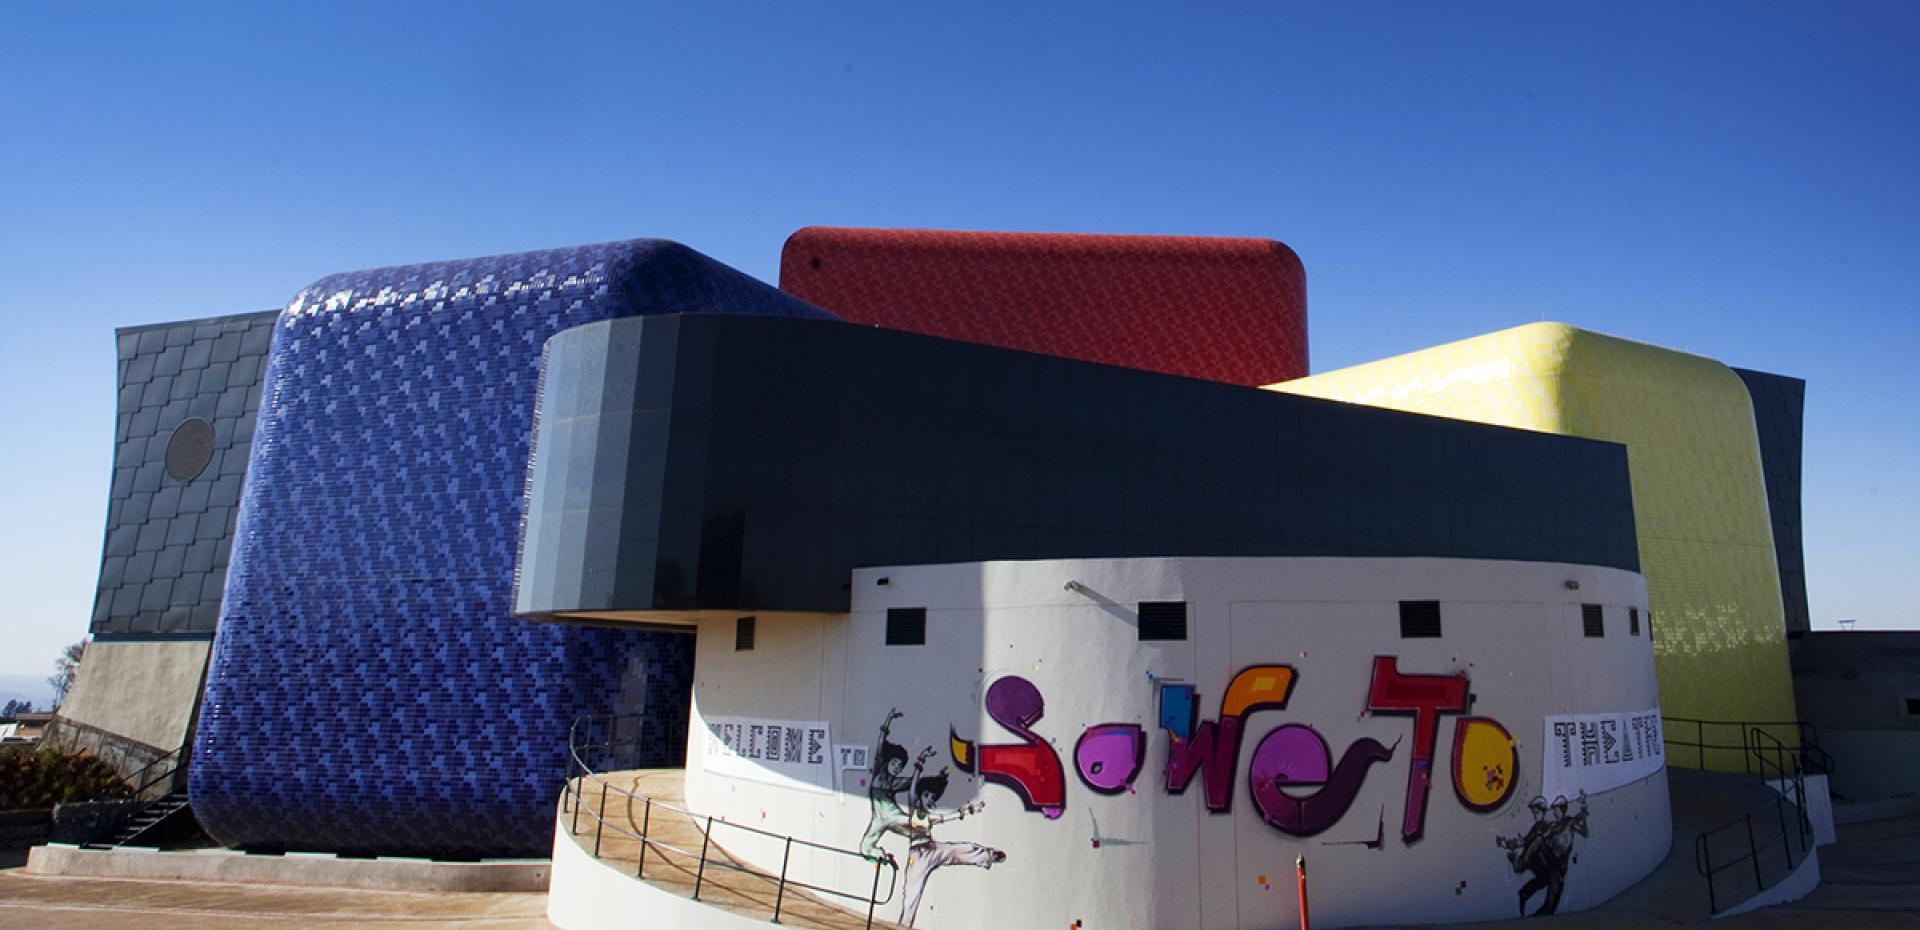 Soweto Theatre - Johannesburg Sud Africa